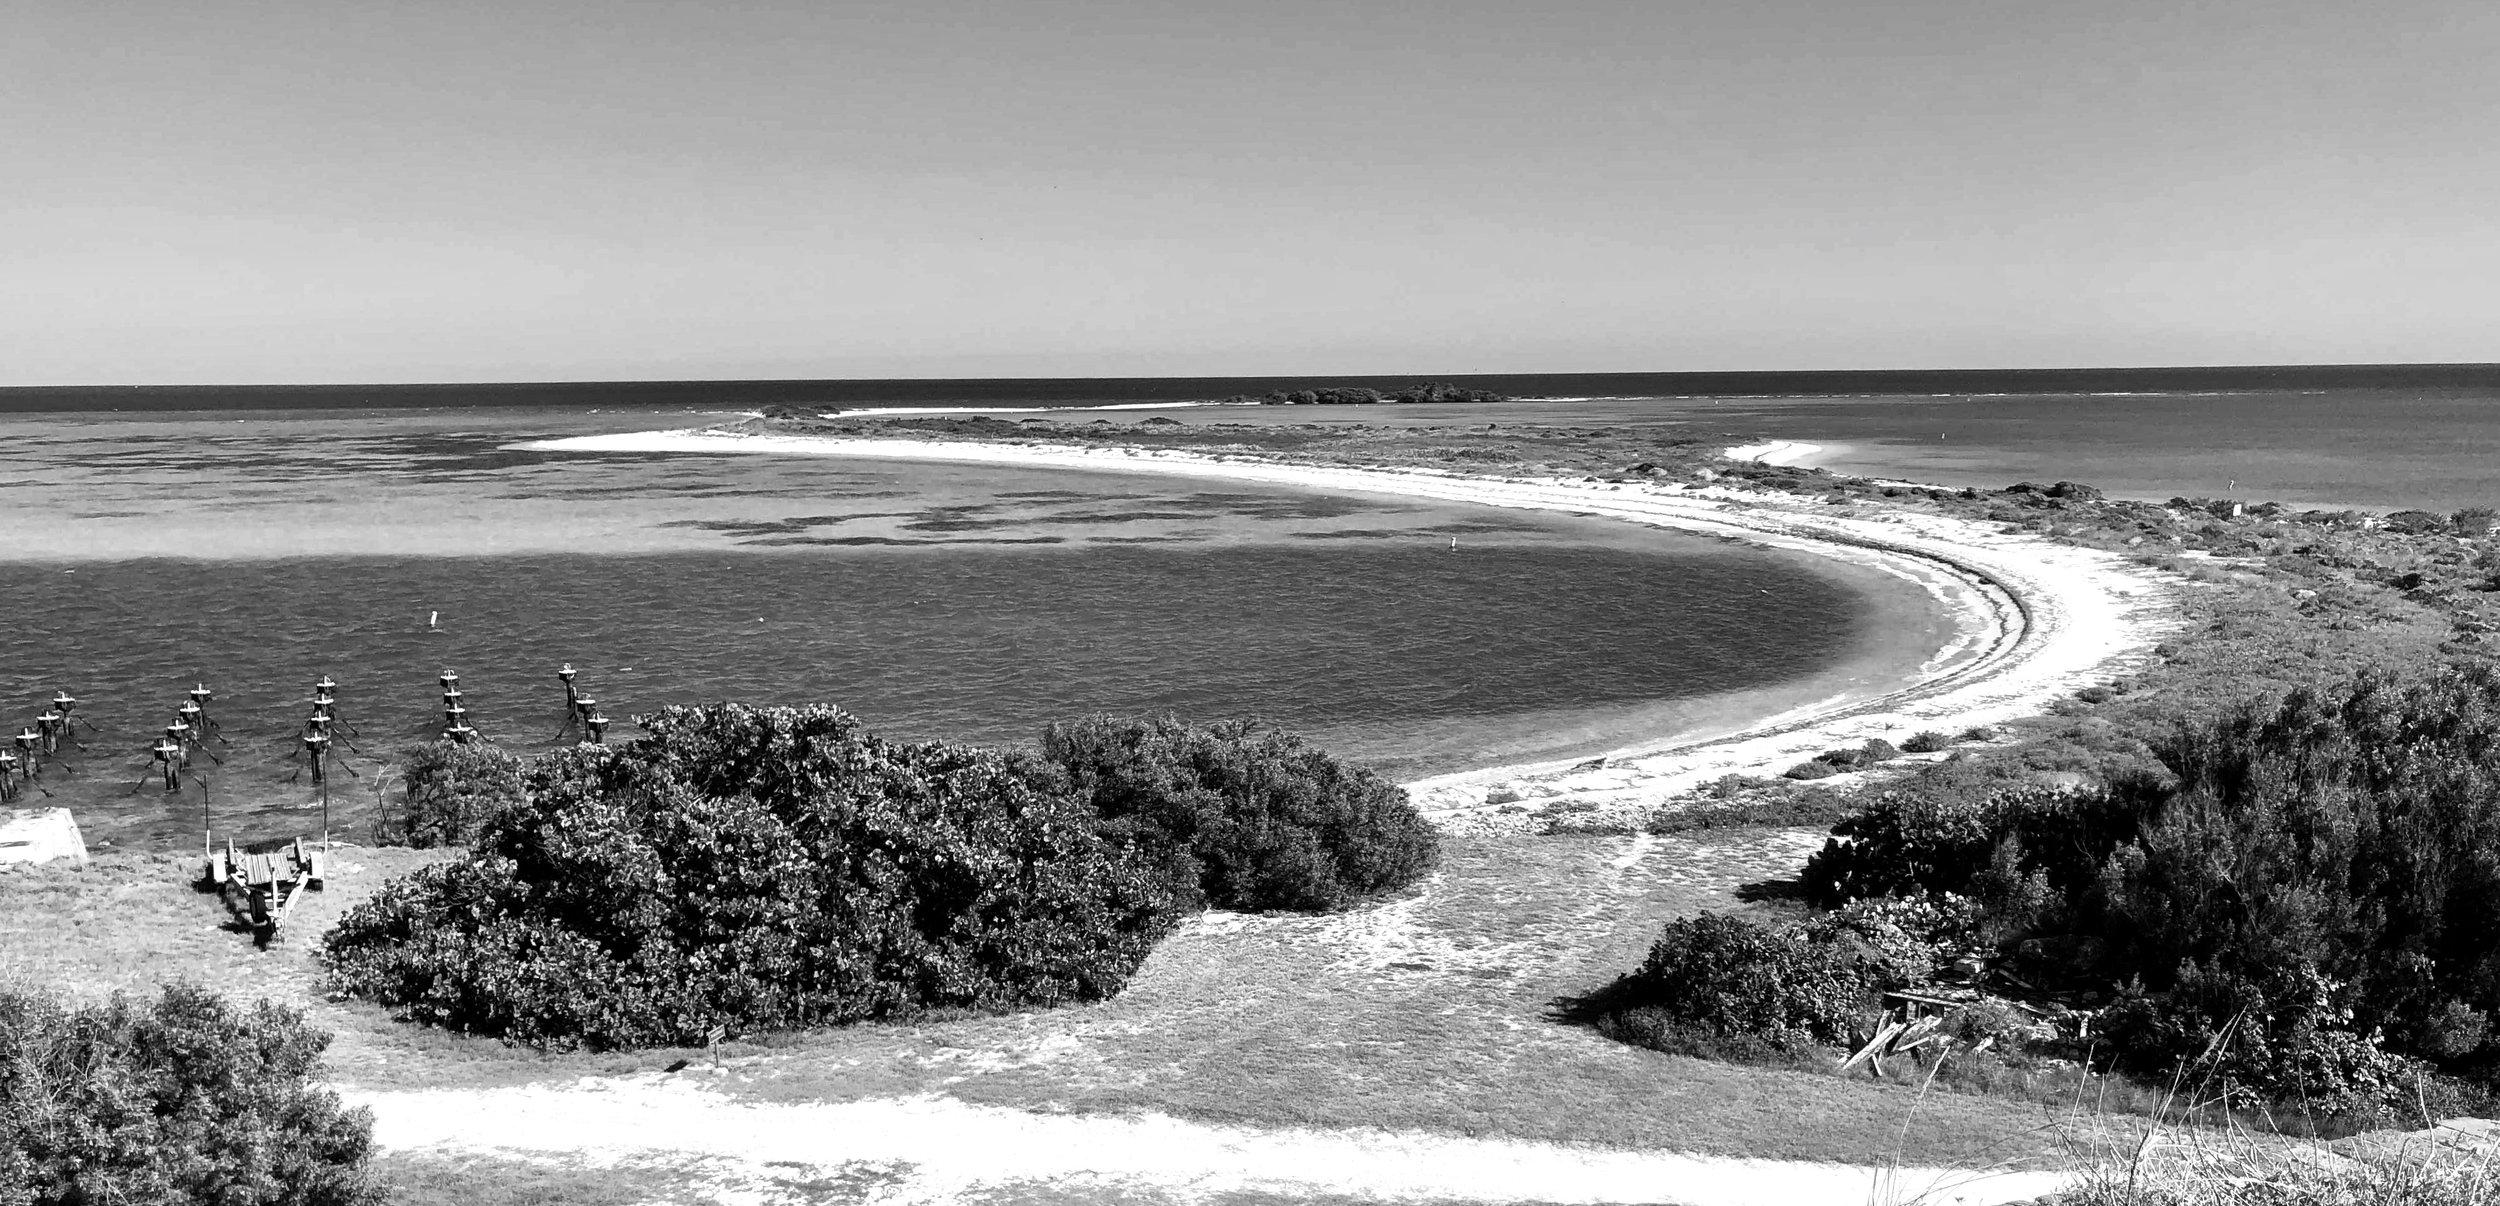 Infinite View, Dry Tortugas